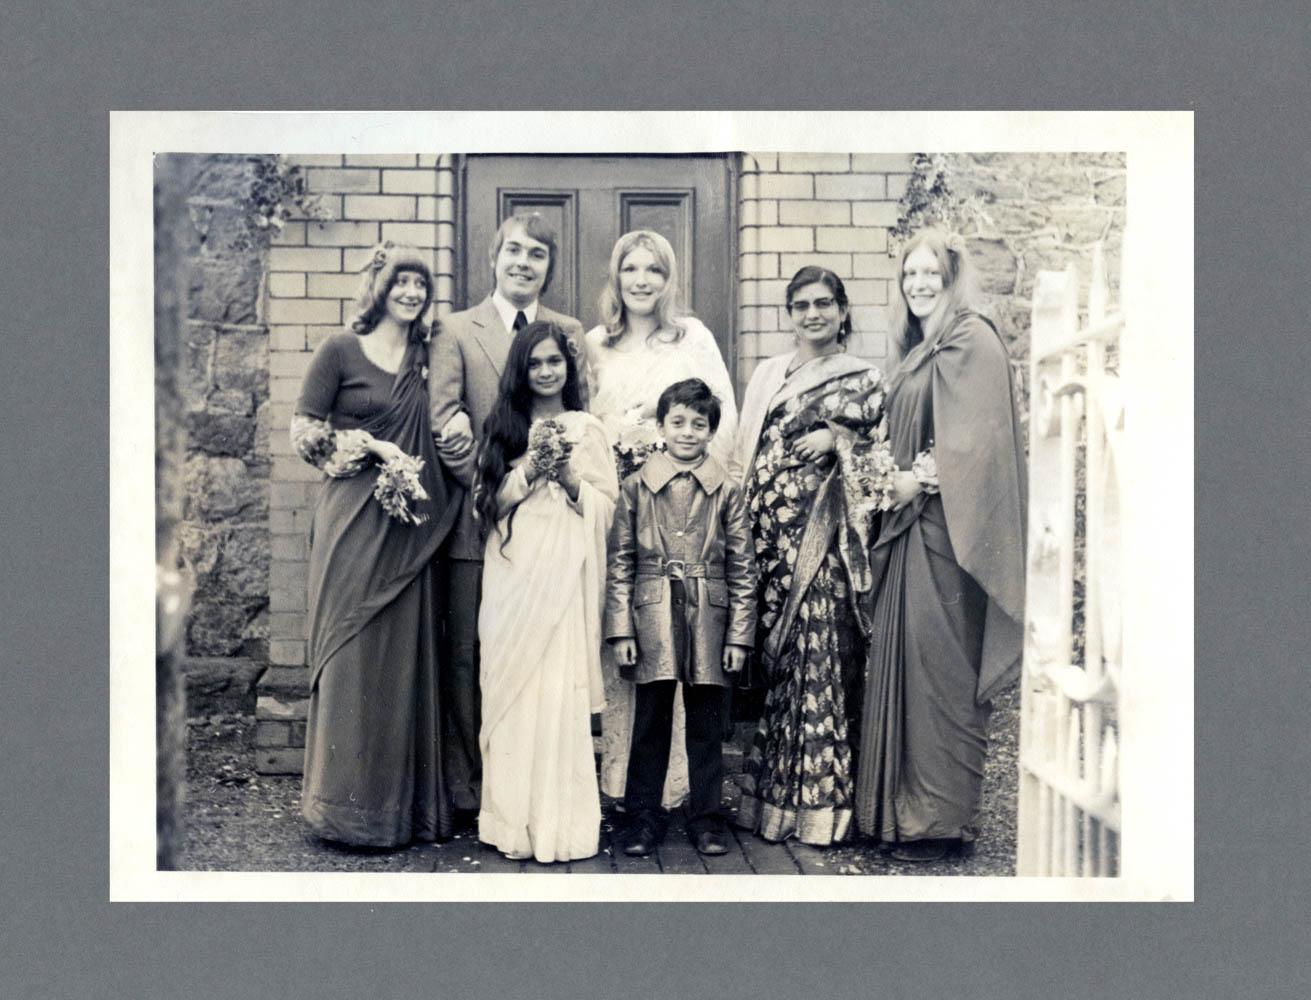 Wales c.1972